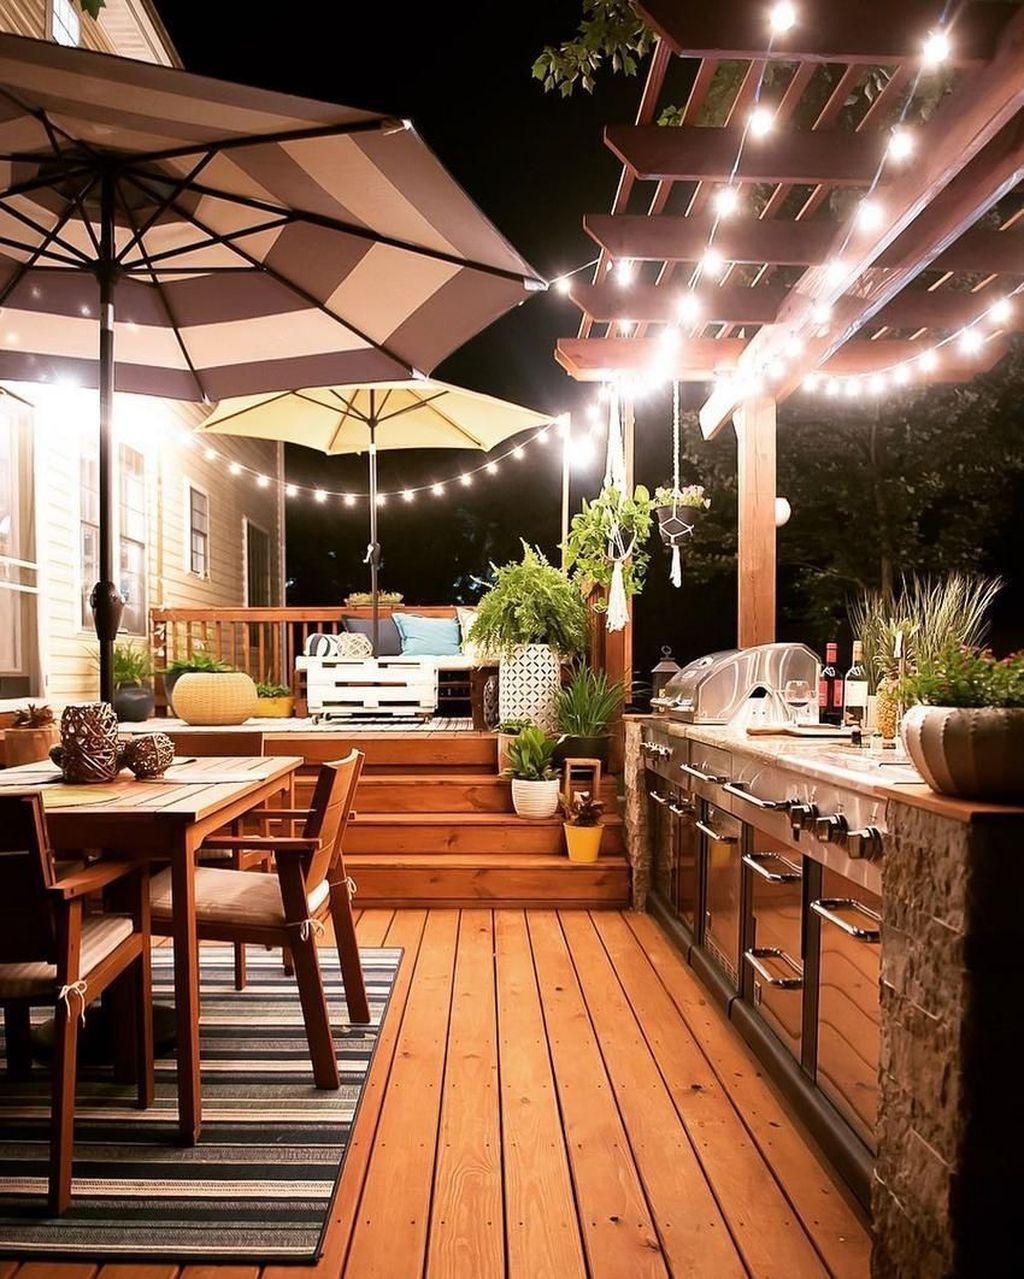 Best Outdoor Kitchen Decor Ideas For Perfect Kitchen 05 In 2020 Outdoor Kitchen Decor Diy Outdoor Kitchen Patio Kitchen